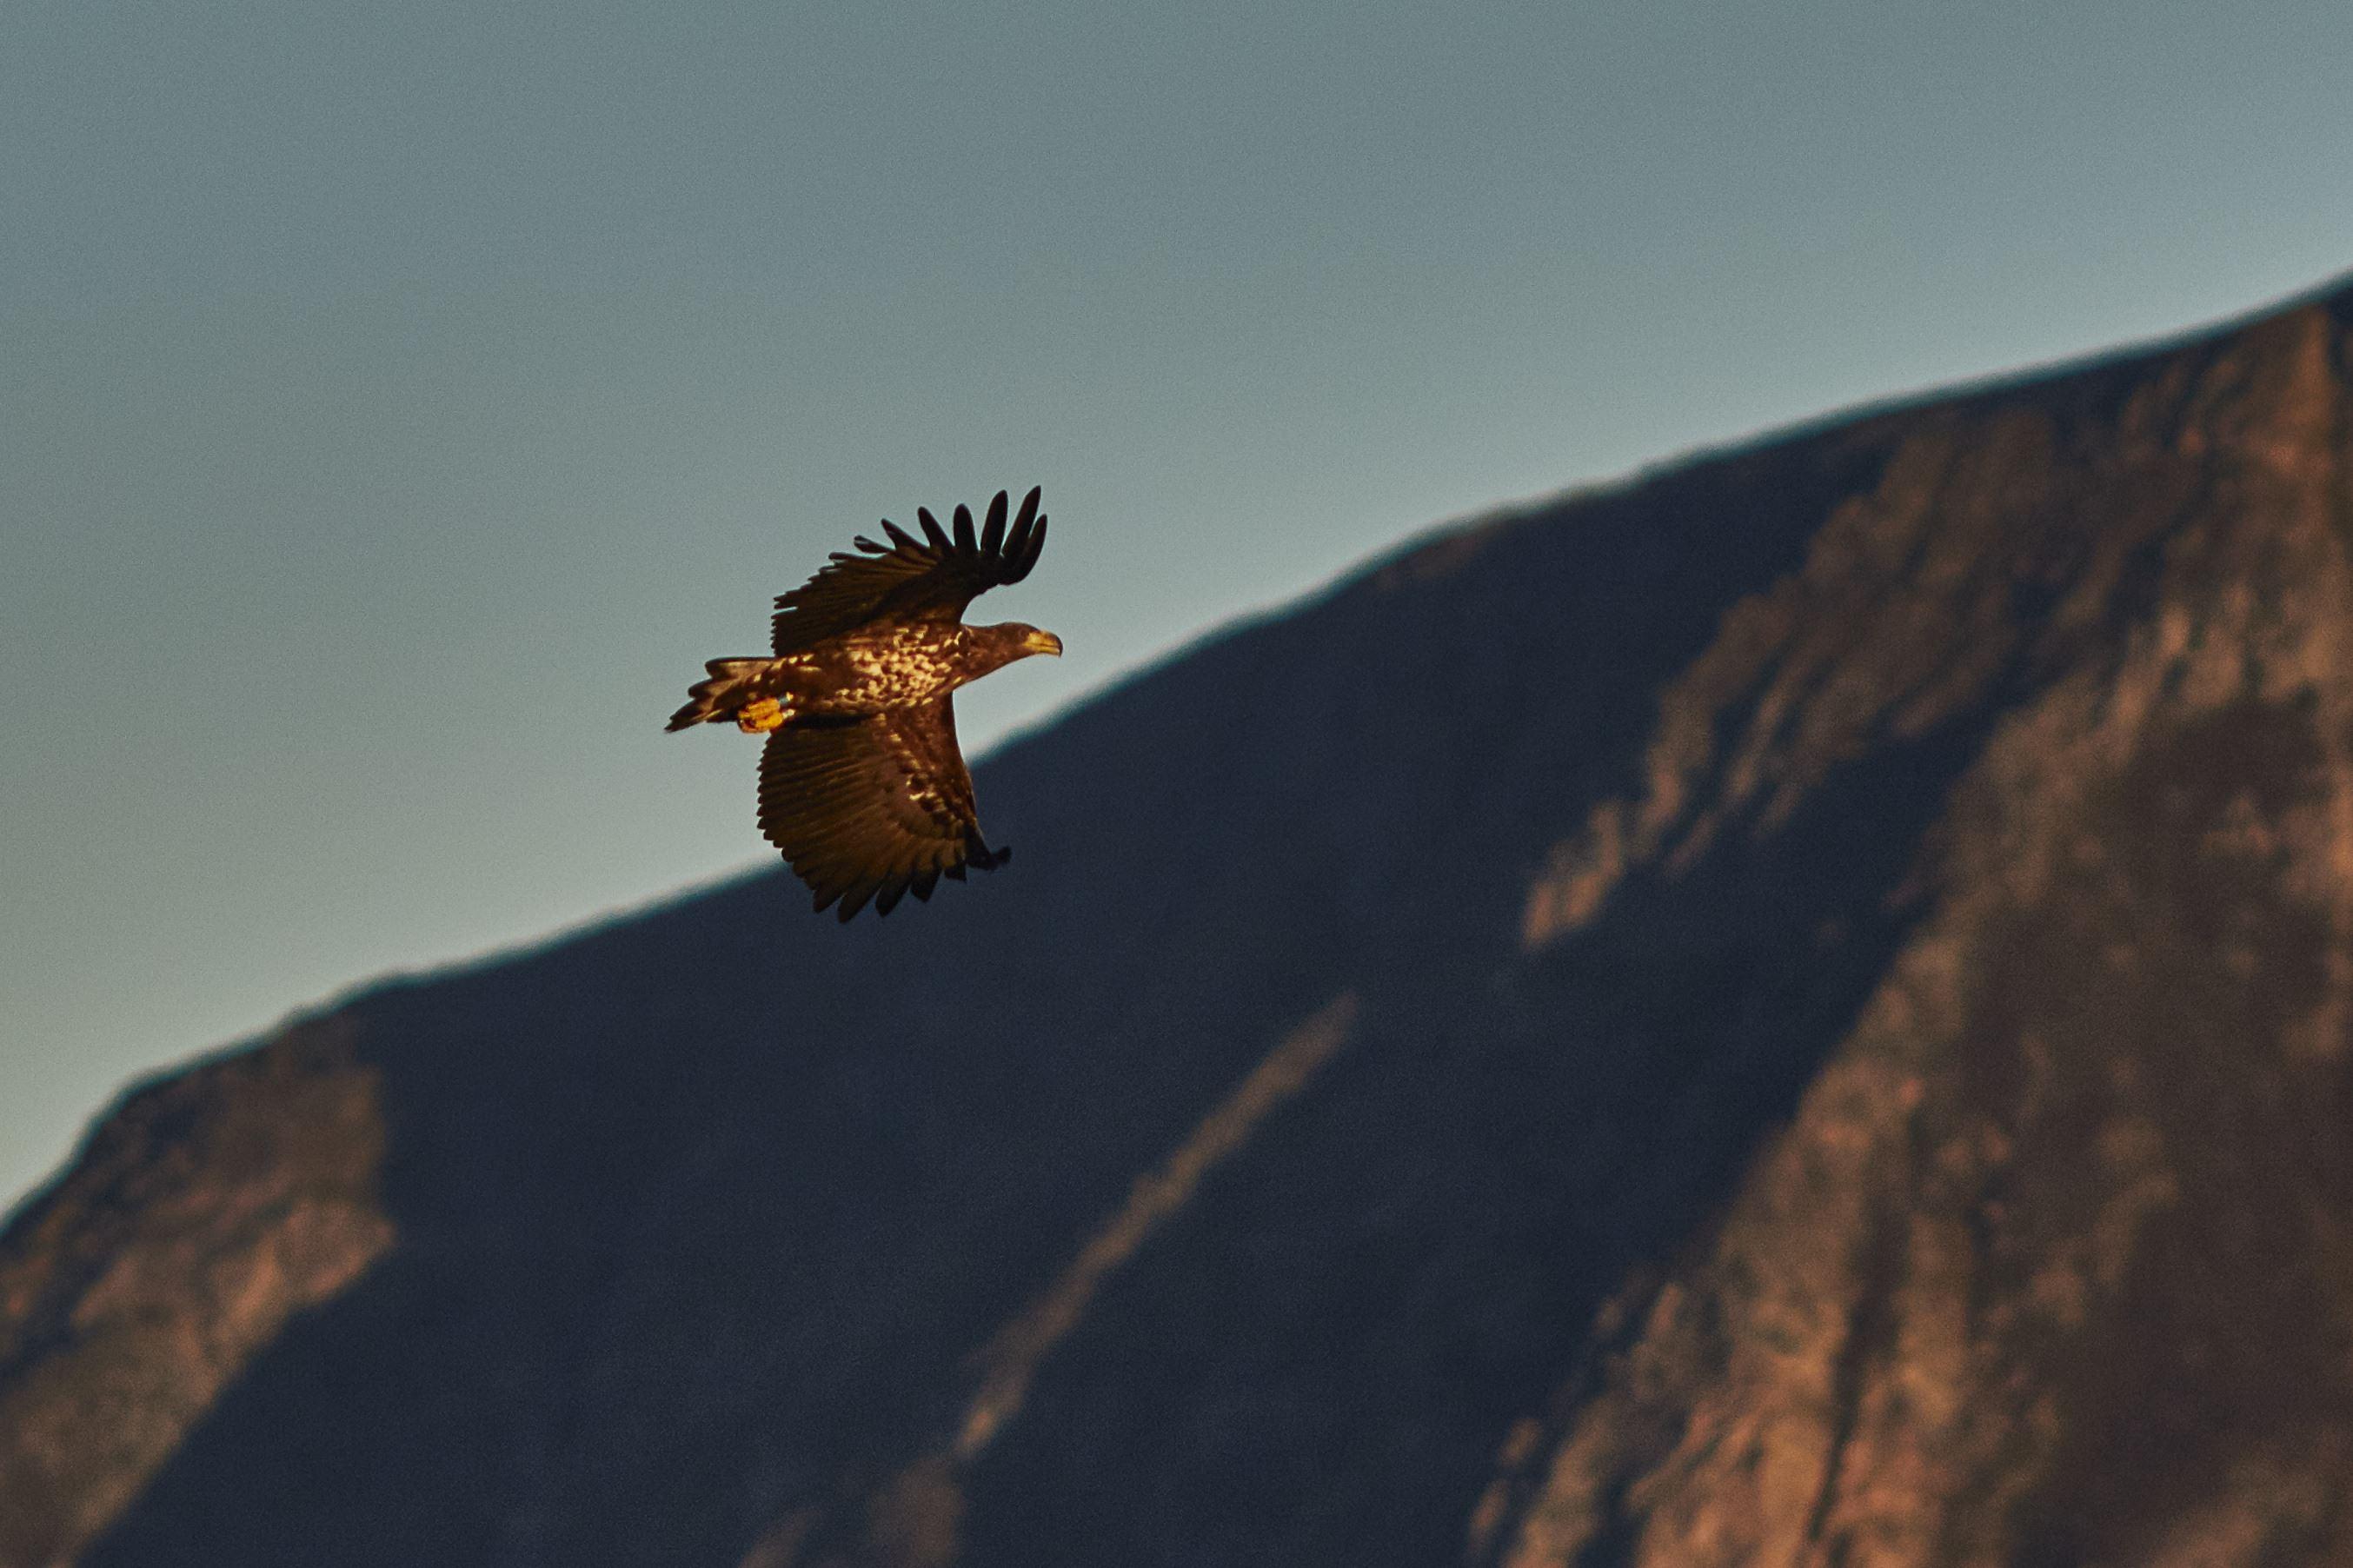 Nature & wildlife photo safari by Rib-boat - Green Gold of Norway